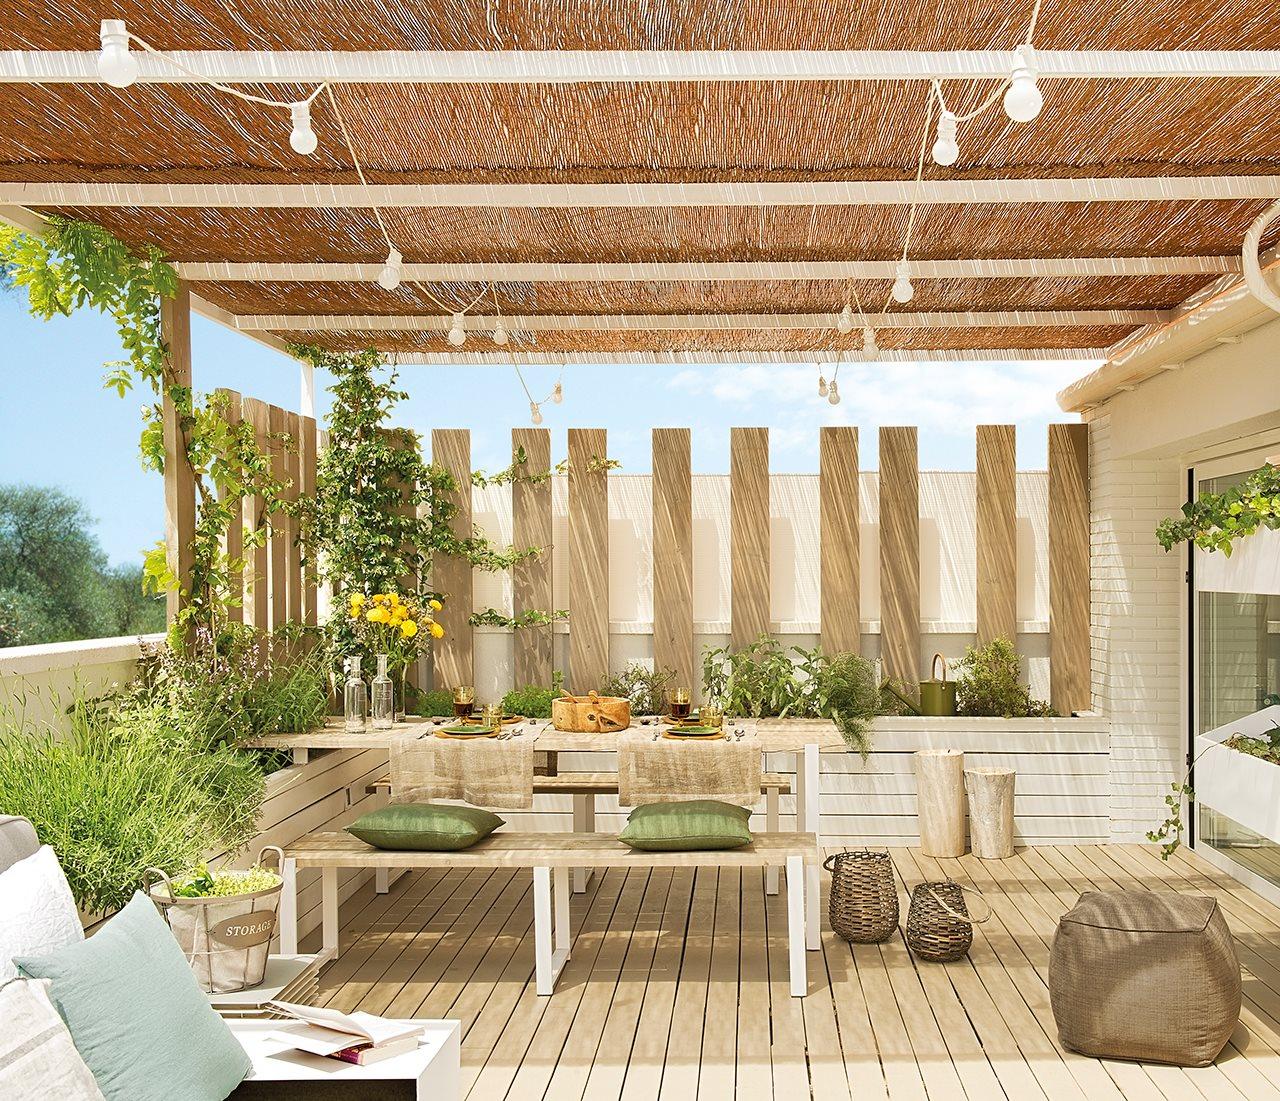 Tres porches tres estilos - Porches para jardin ...